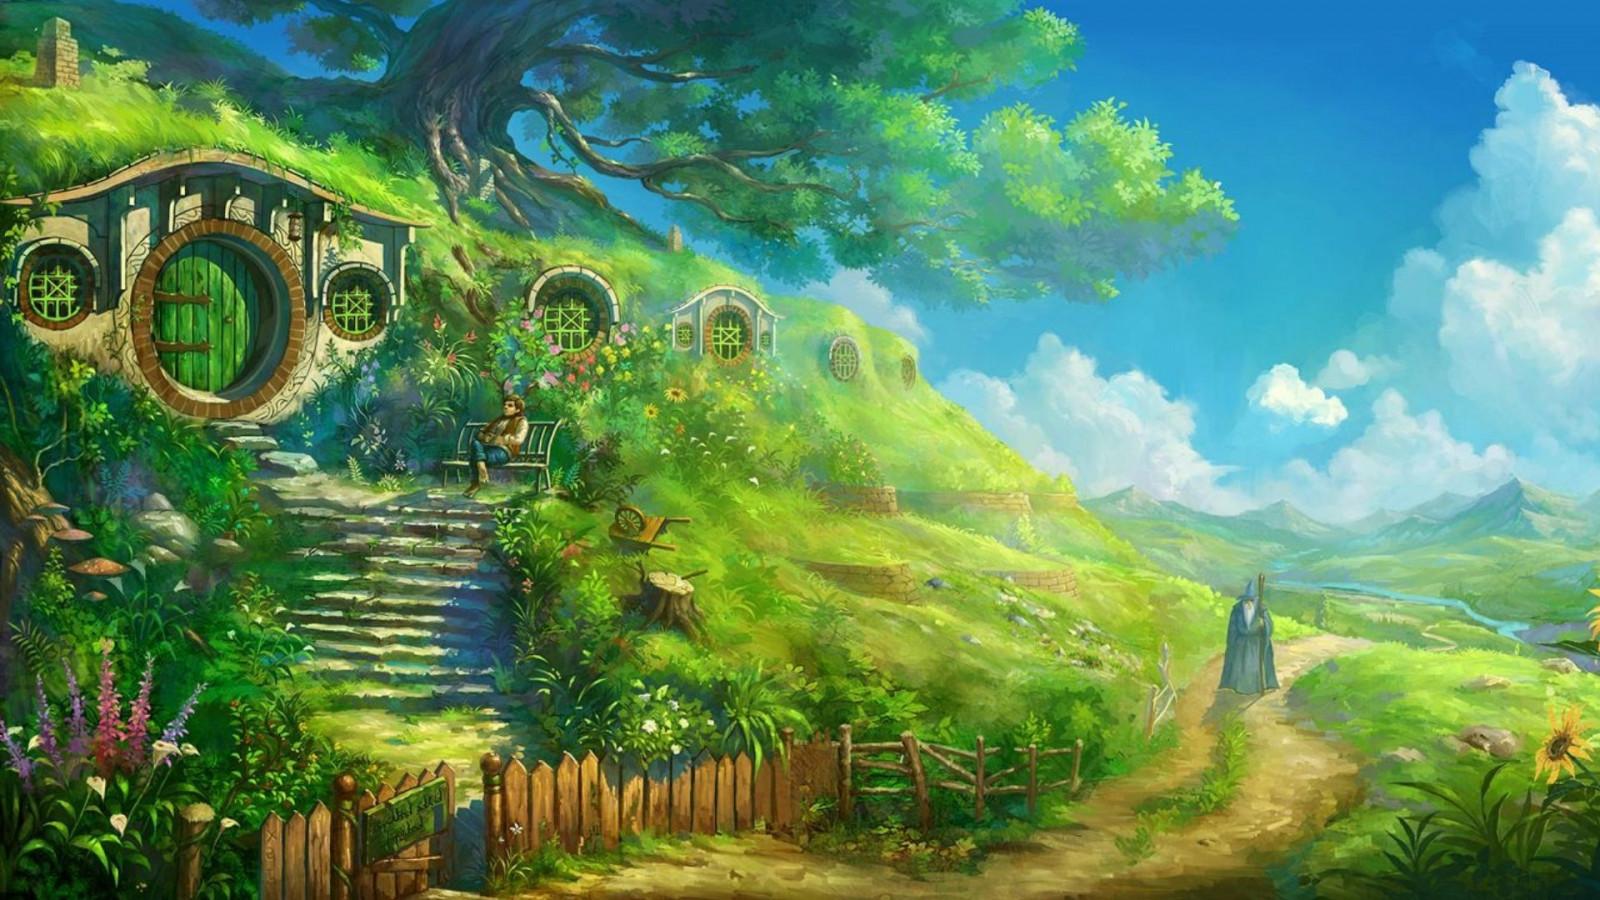 1920x1080_px_artwork_Bag_End_Bilbo_Baggins_gandalf_Hobbits_path_The_Lord_Of_The_Rings-665262.jpg!d